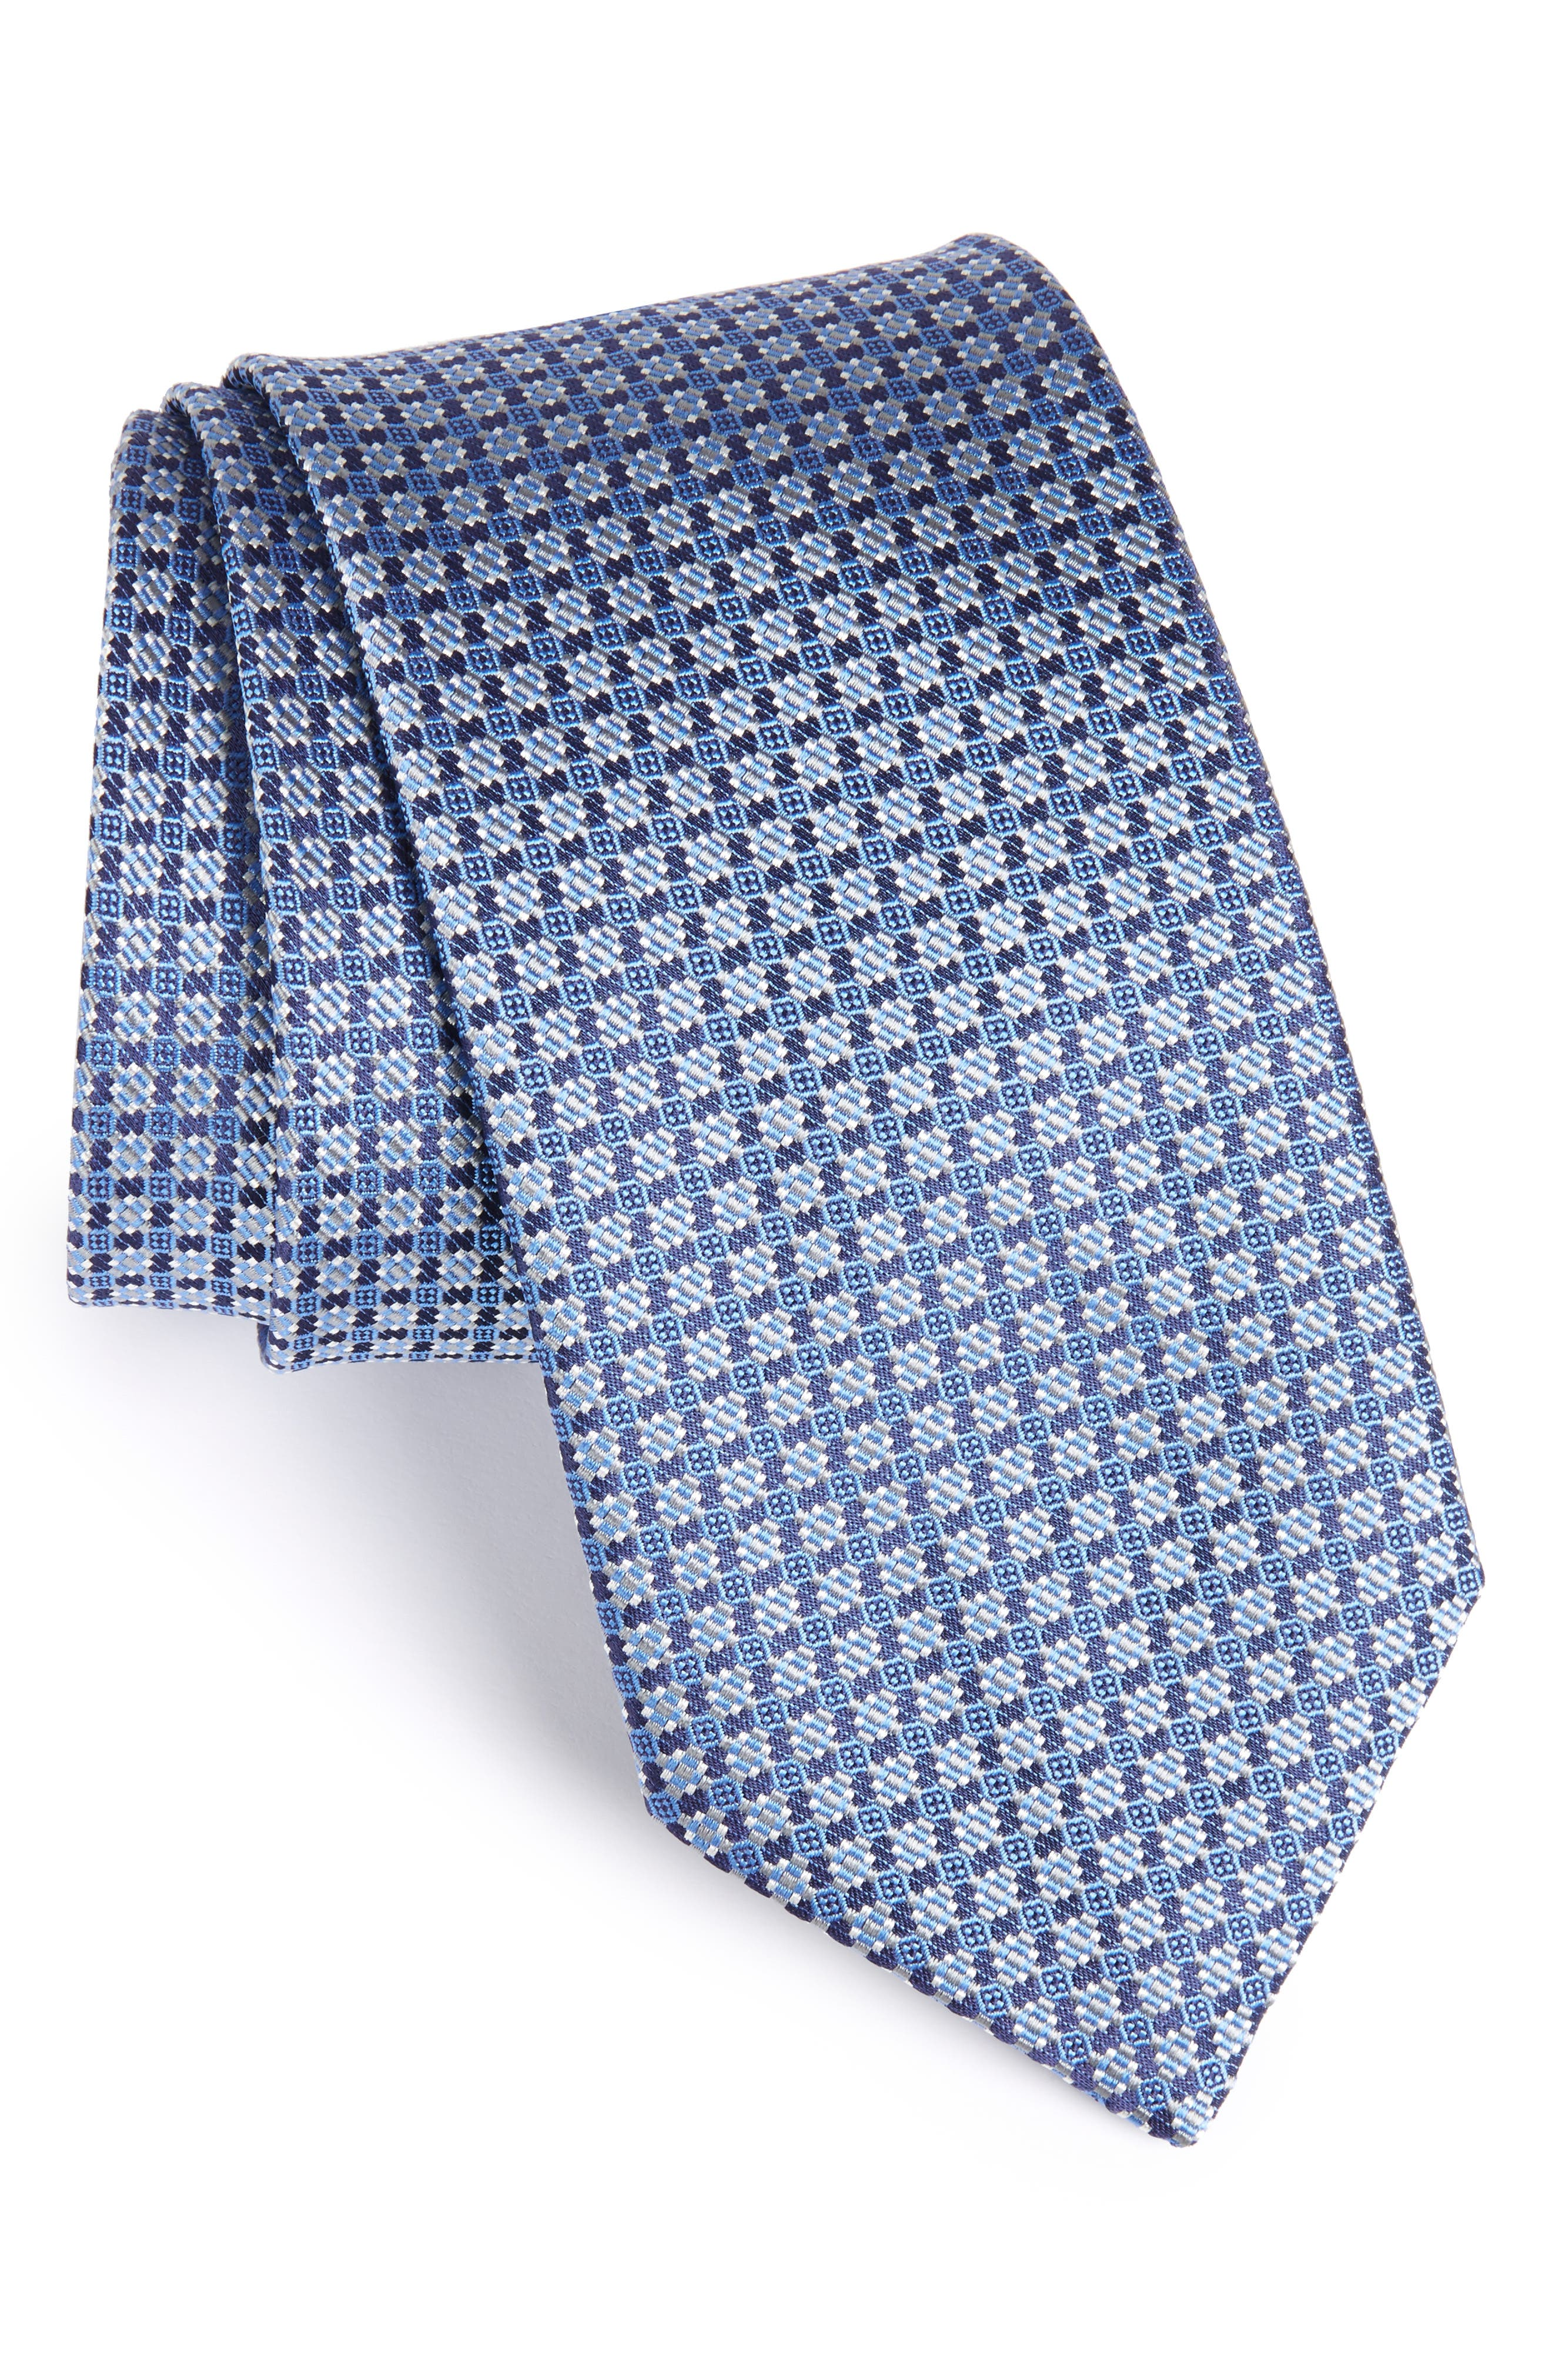 Neat Silk Tie,                             Main thumbnail 1, color,                             Blue/ Grey